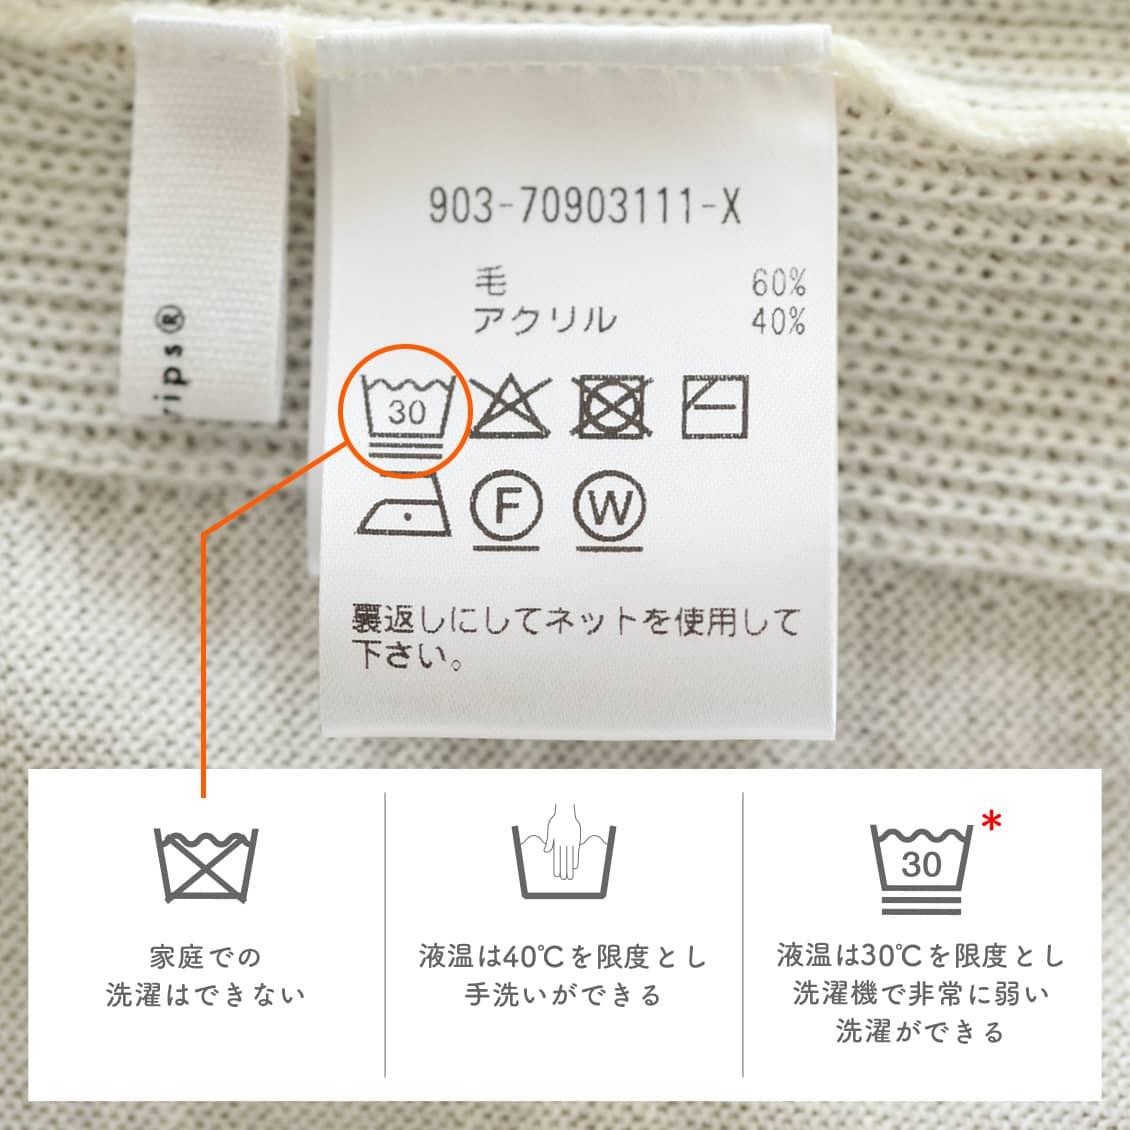 a7201423c8053 ニット・セーターの洗濯方法プロが教える洗濯機・手洗いと干し方 - 北欧 ...